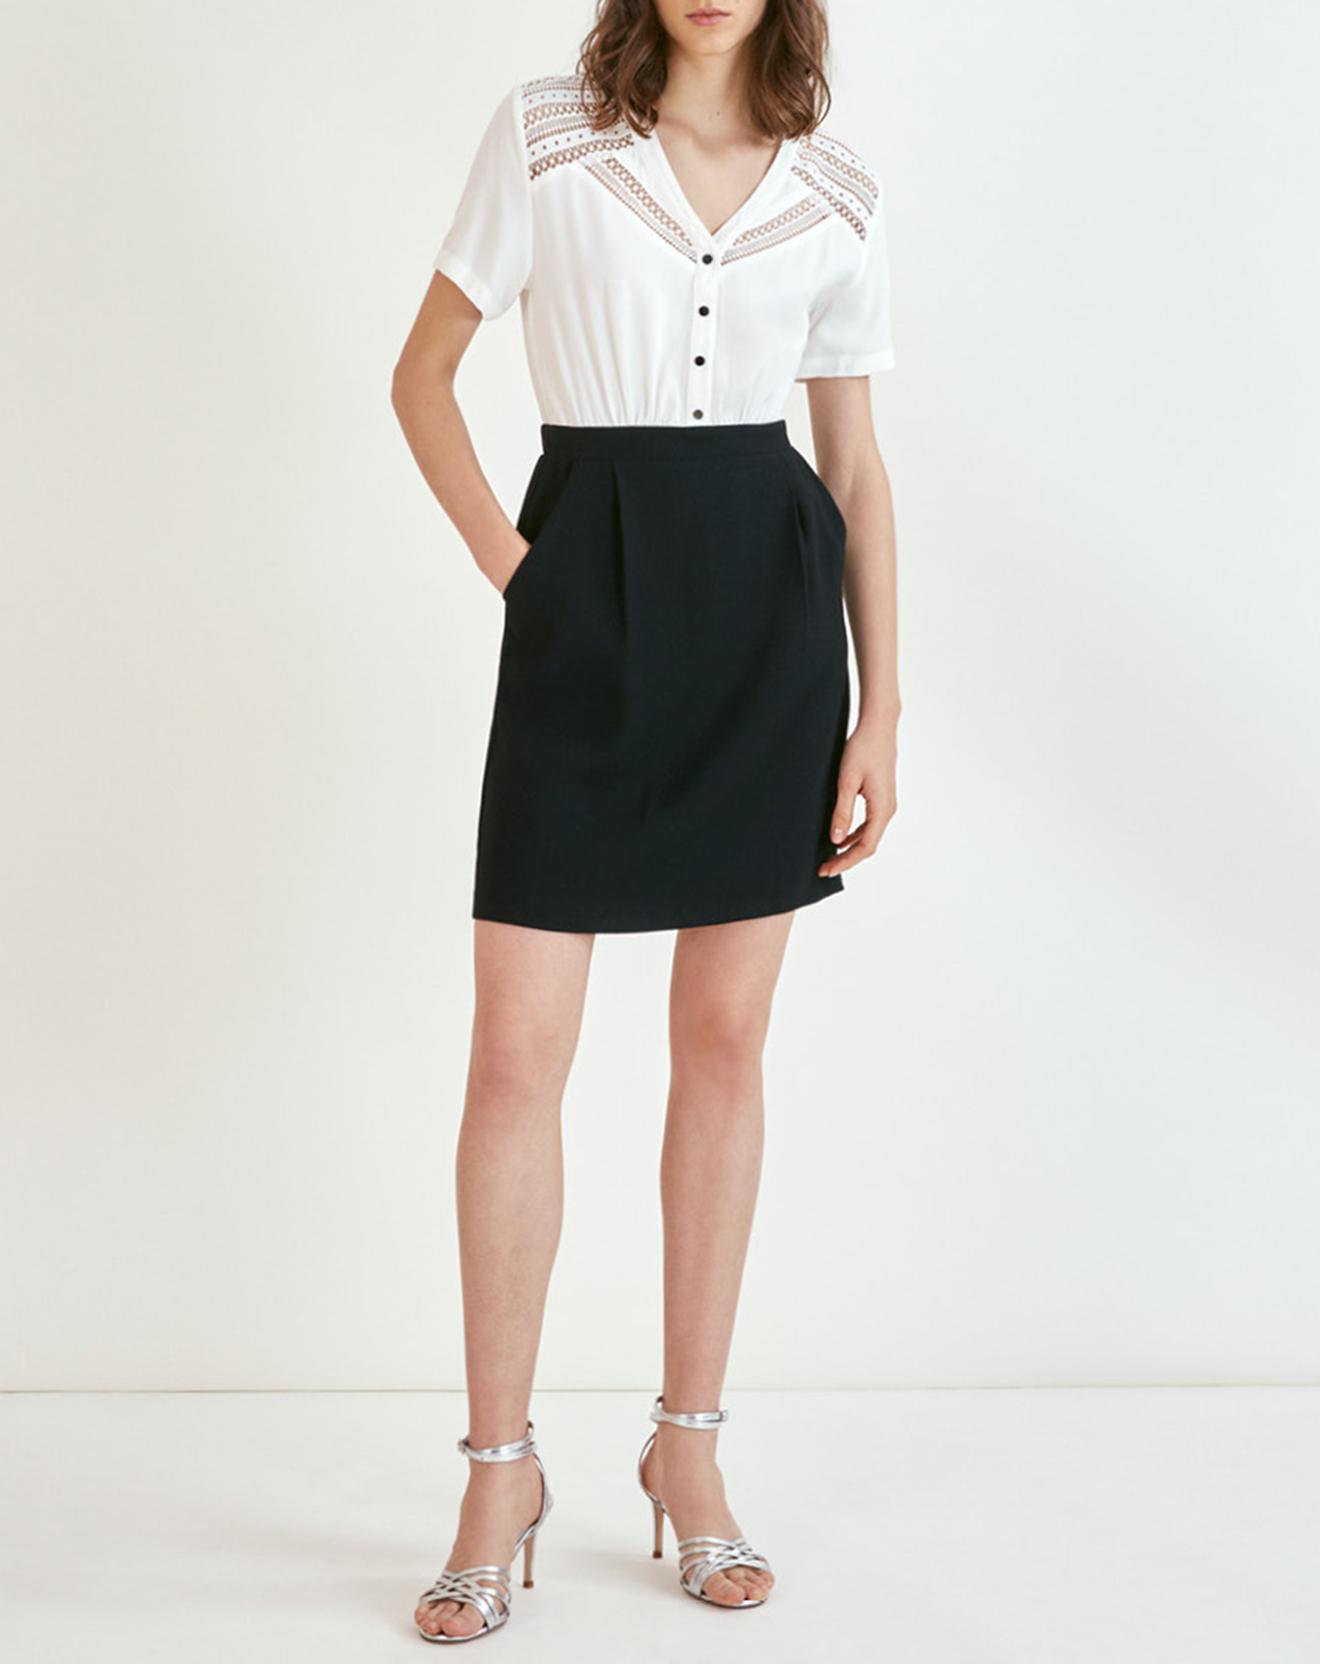 Robe Cristal blanc/noir - Suncoo - Modalova